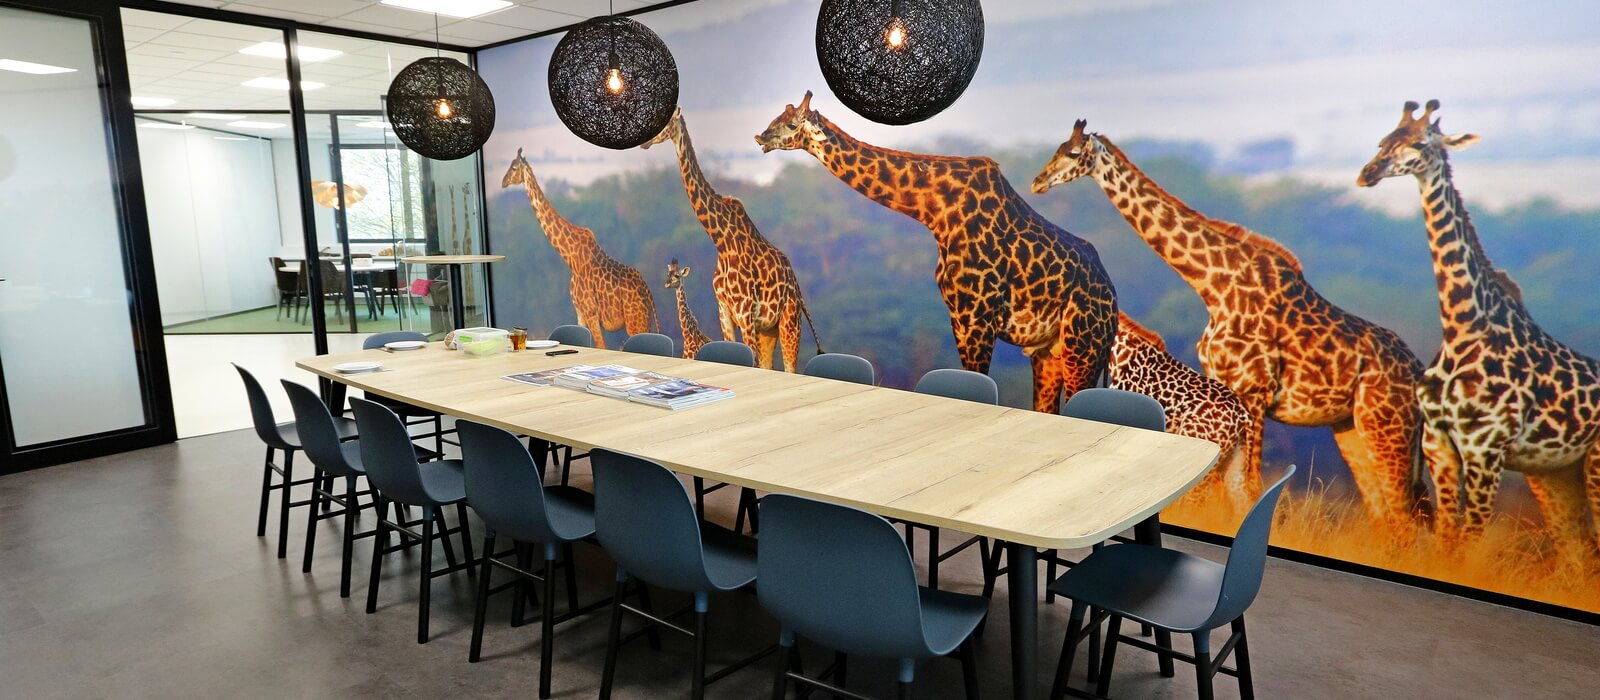 Jambo lunchruimte met wandvisual giraffen